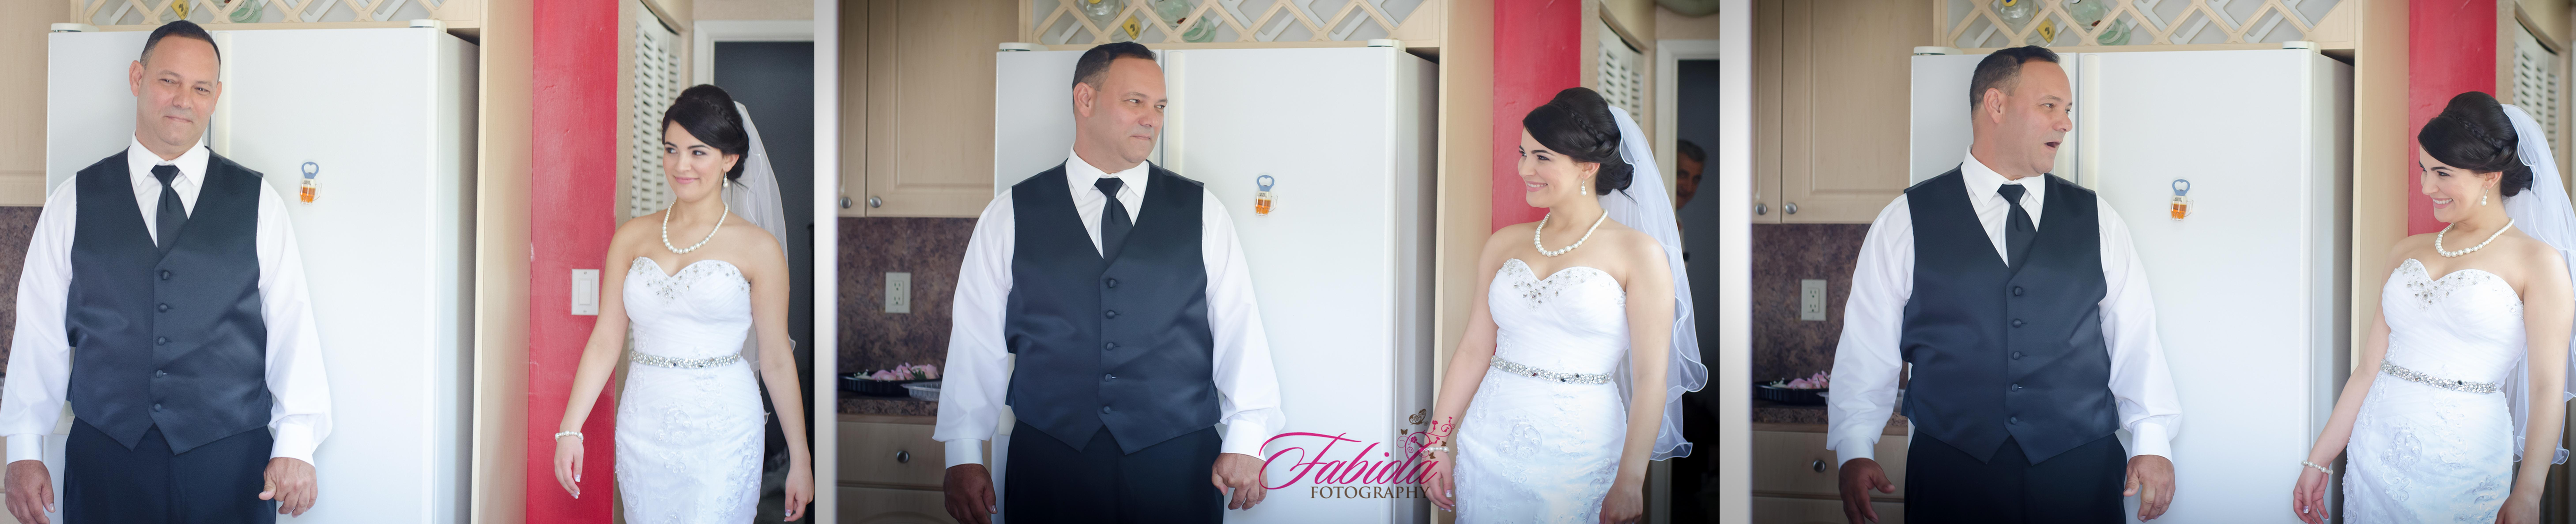 Fabiola Fotography image 24